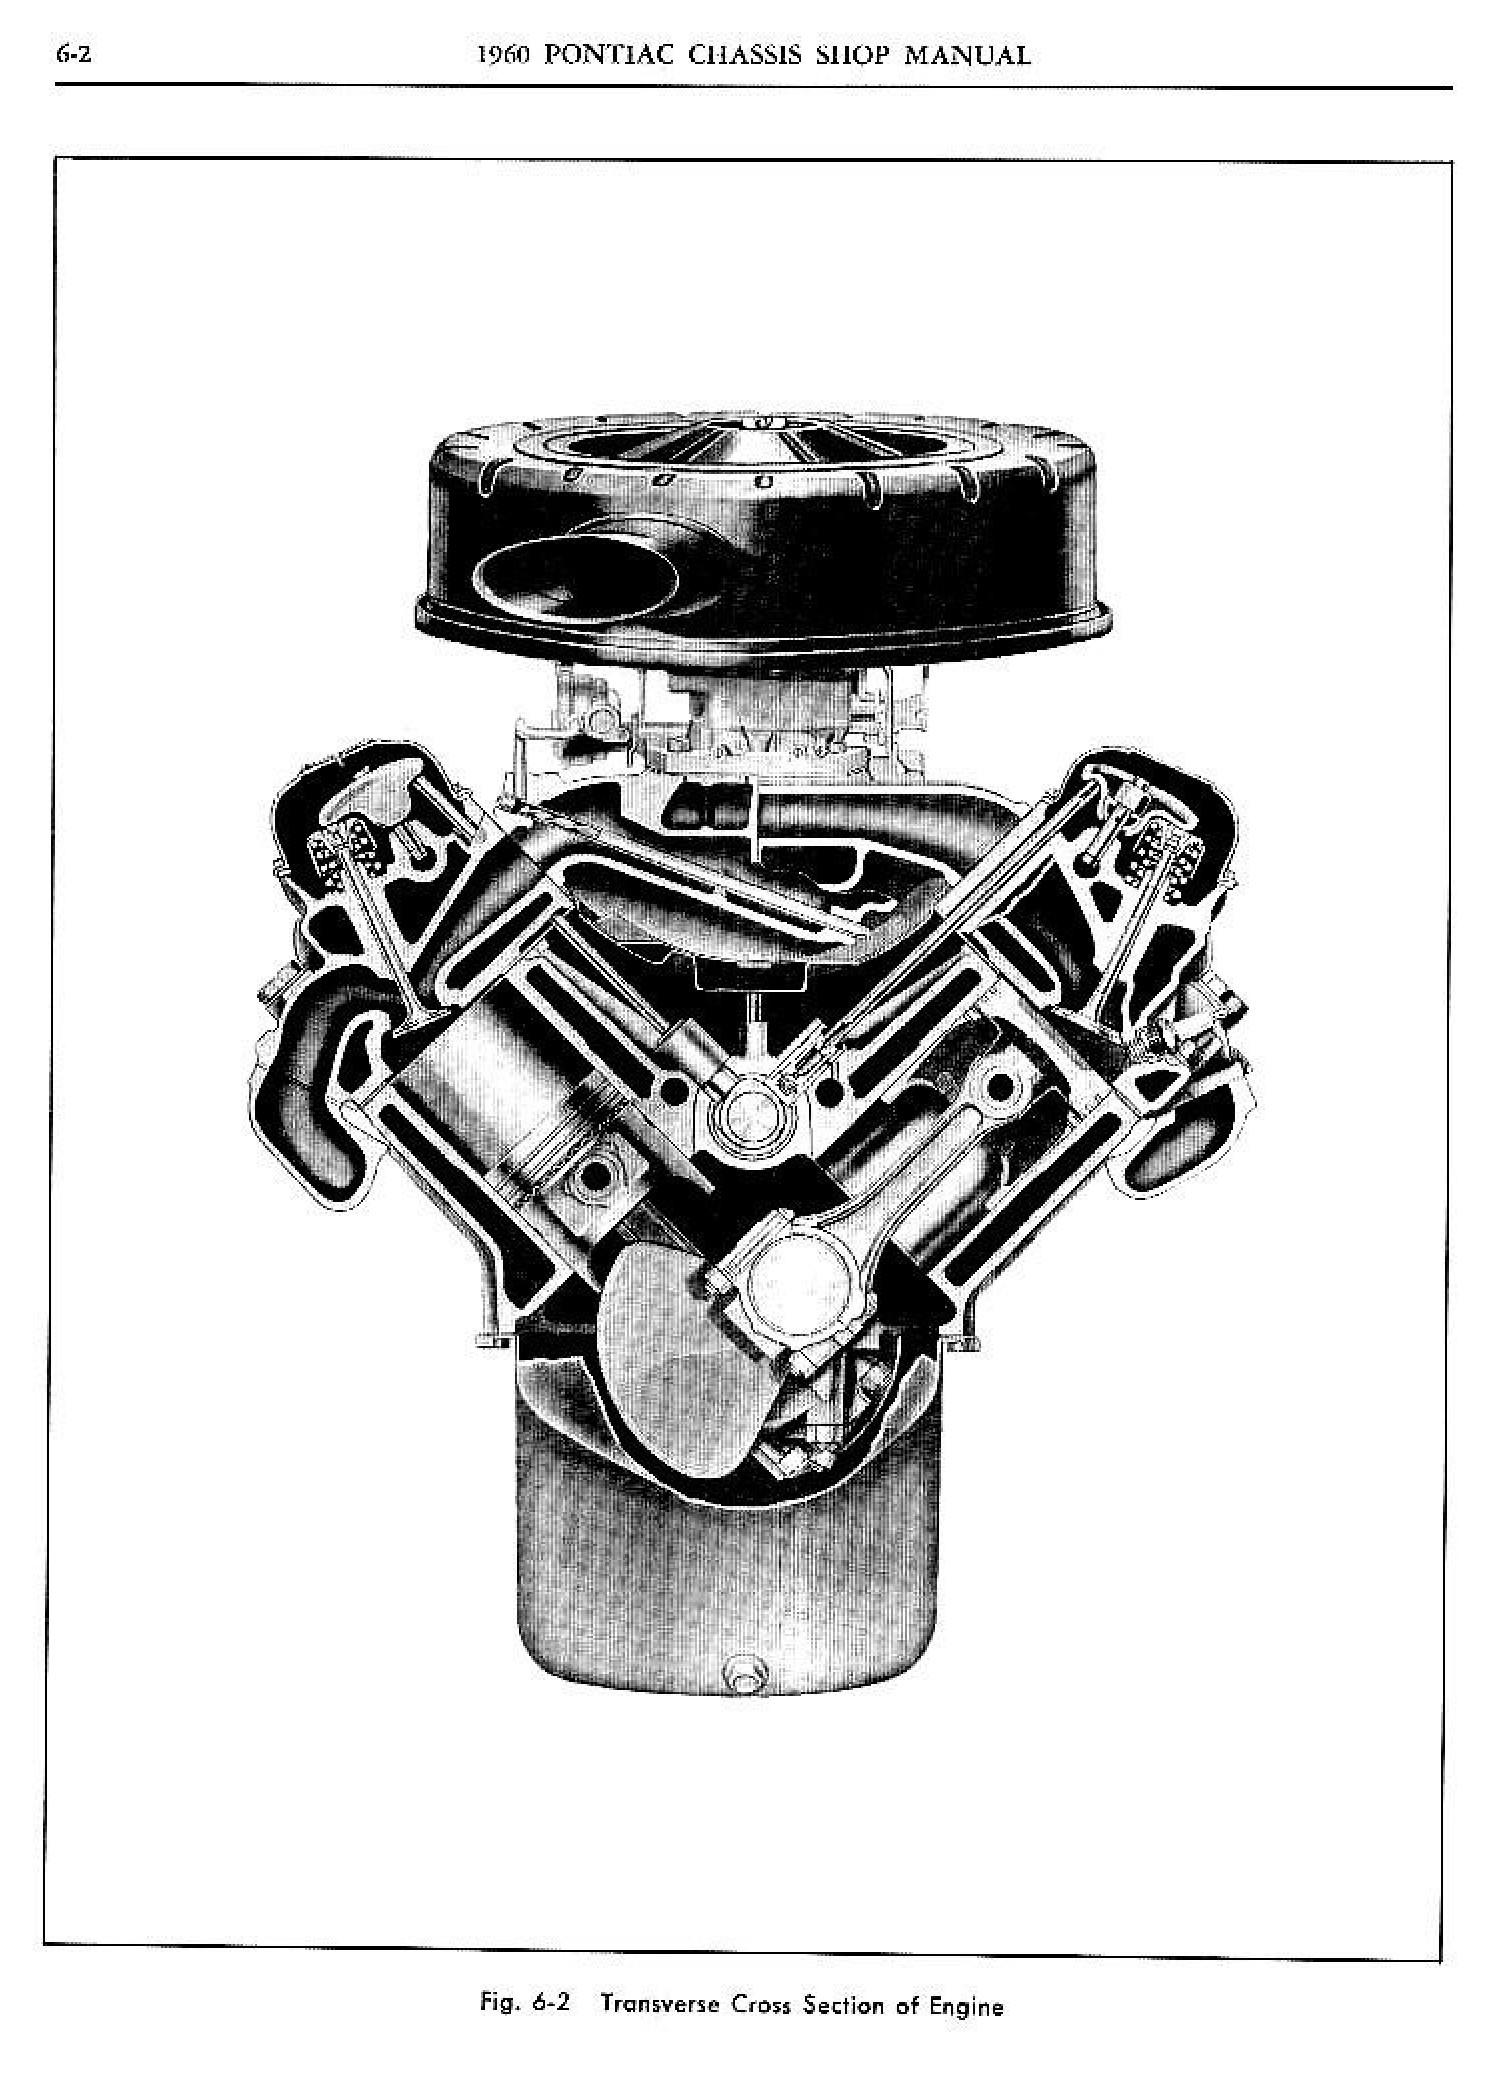 1960 Pontiac Shop Manual- Engine Page 2 of 48